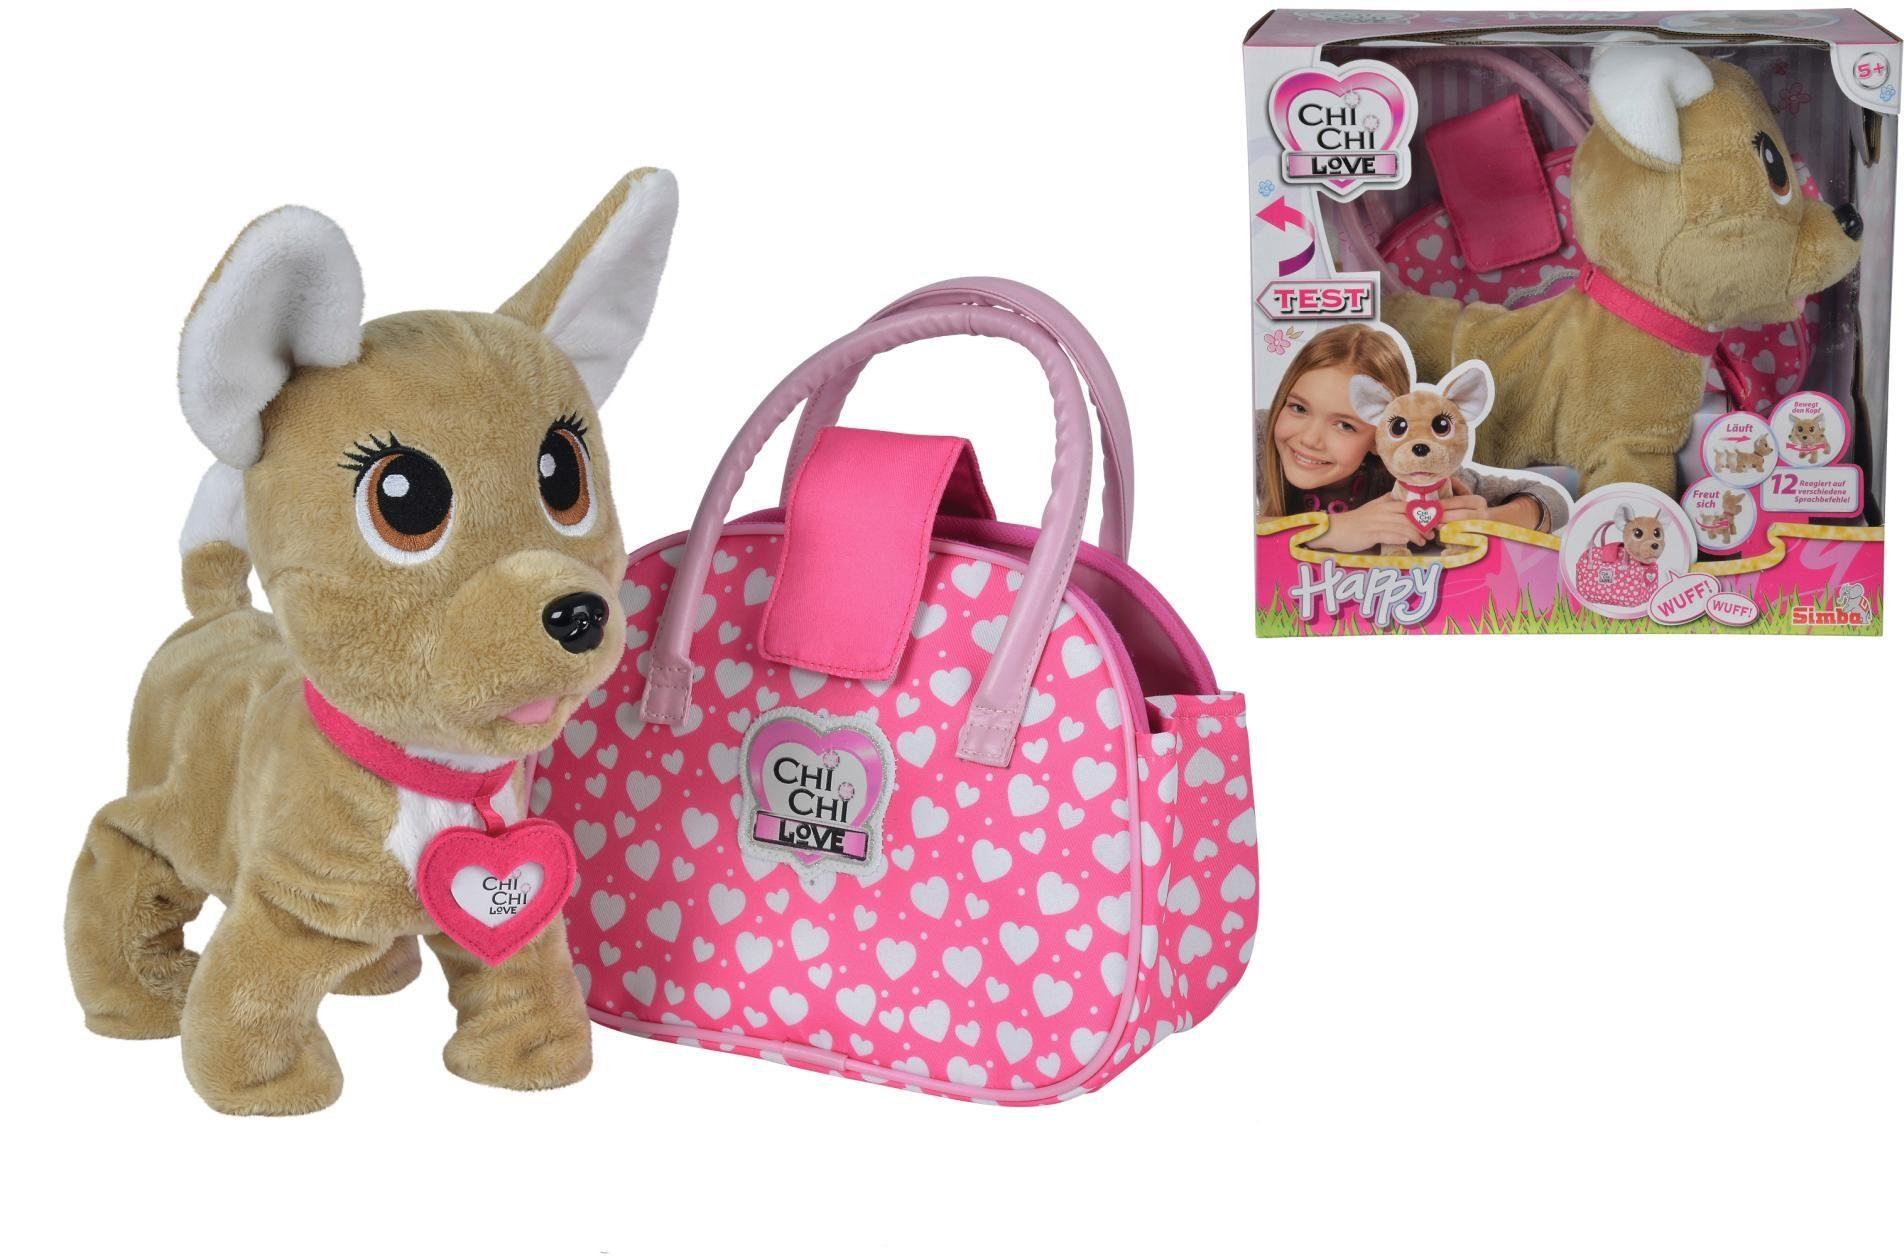 Simba Stofftier mit Tasche, »Chi Chi Love, Chihuahua Plüschhund Happy«